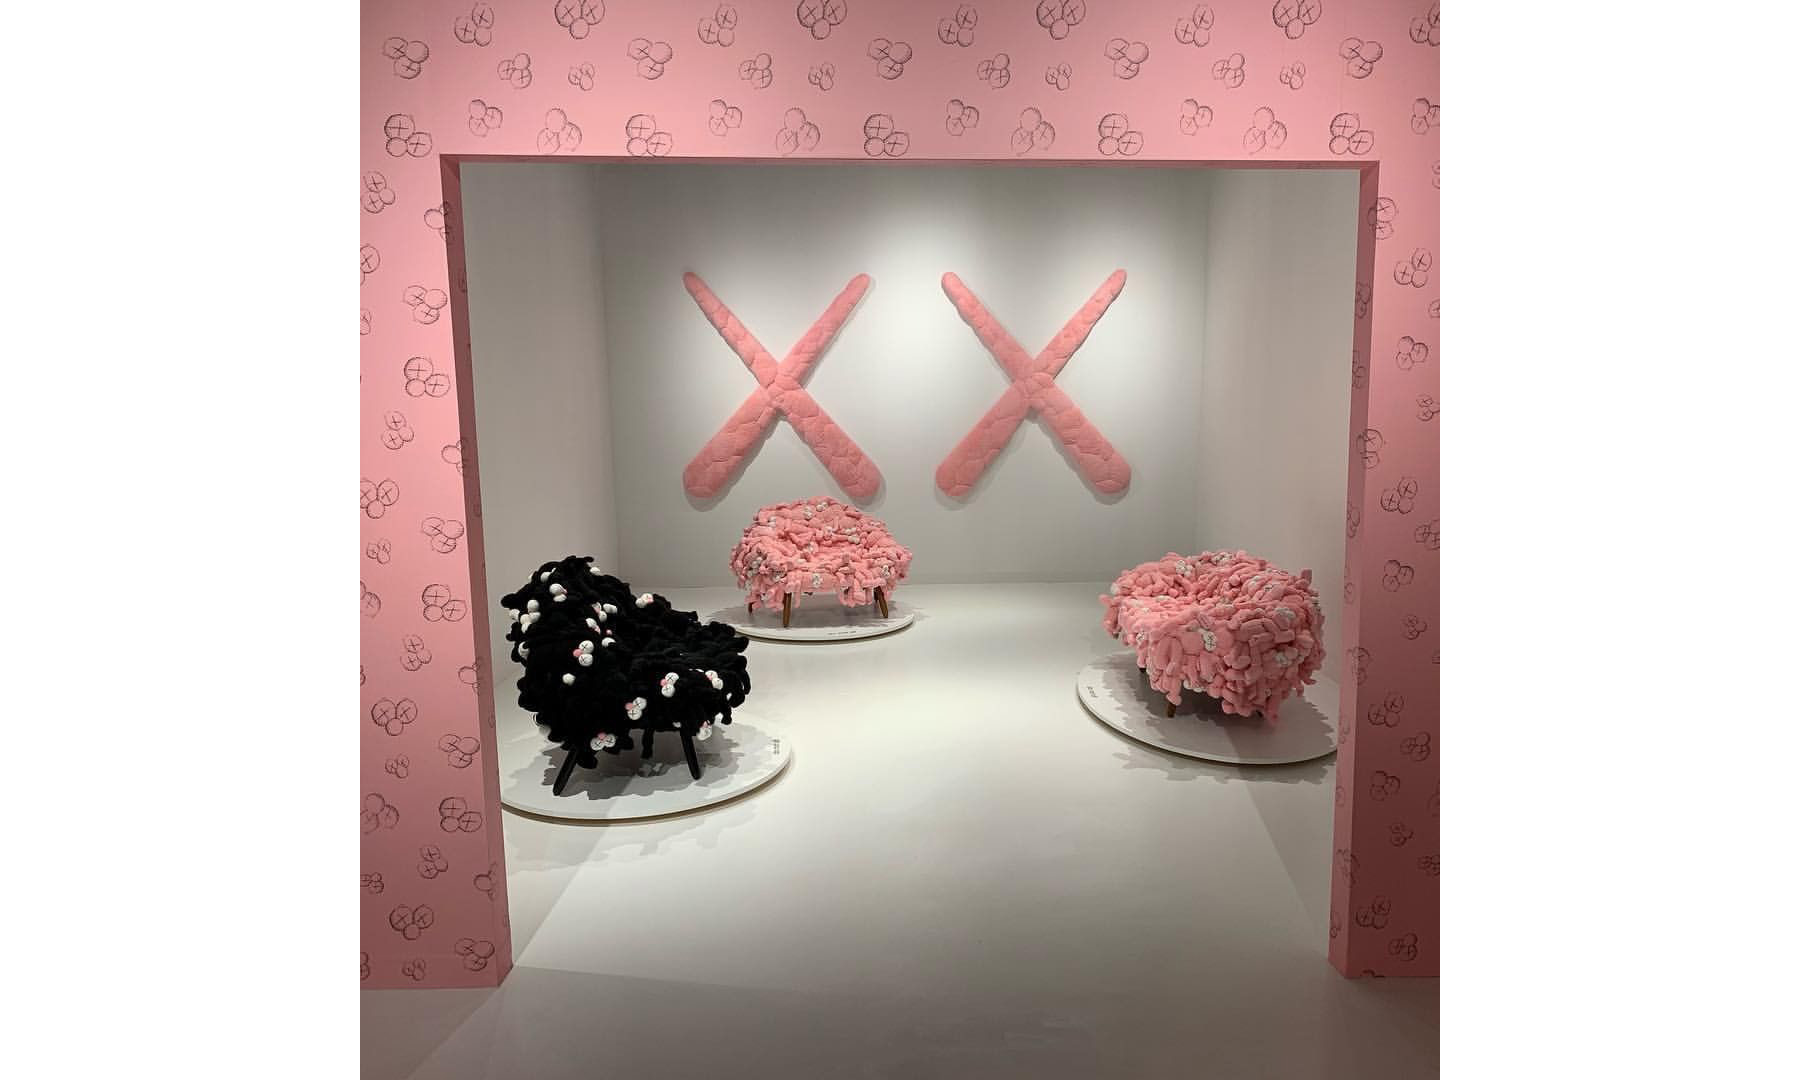 KAWS 成为今年 Art Basel 期间在 Instagram 上被提及最多的艺术家